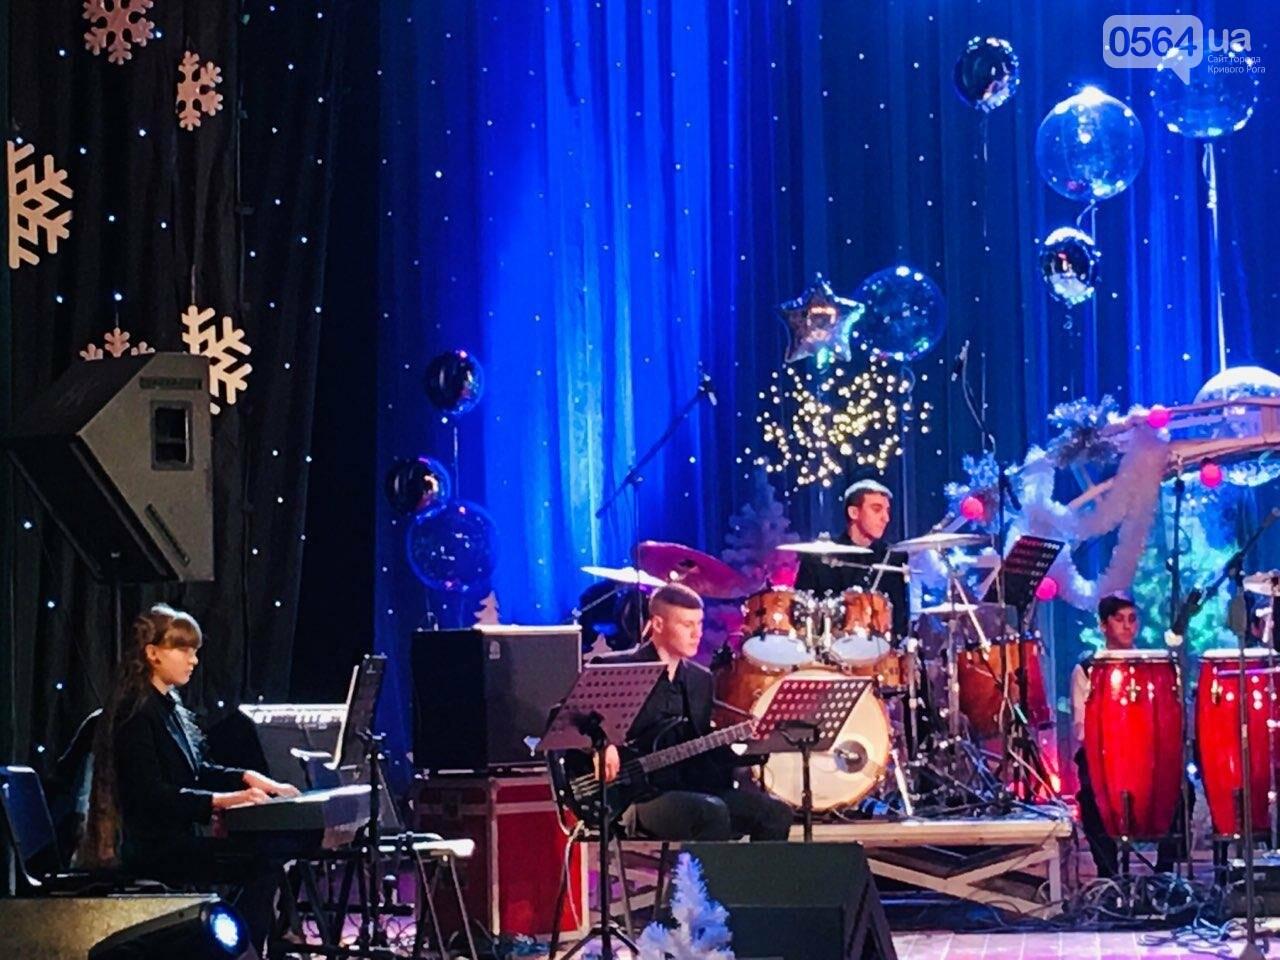 """Let it Snow"": на первое Рождество в Кривом Роге играют джаз, - ФОТО, ВИДЕО, фото-2"